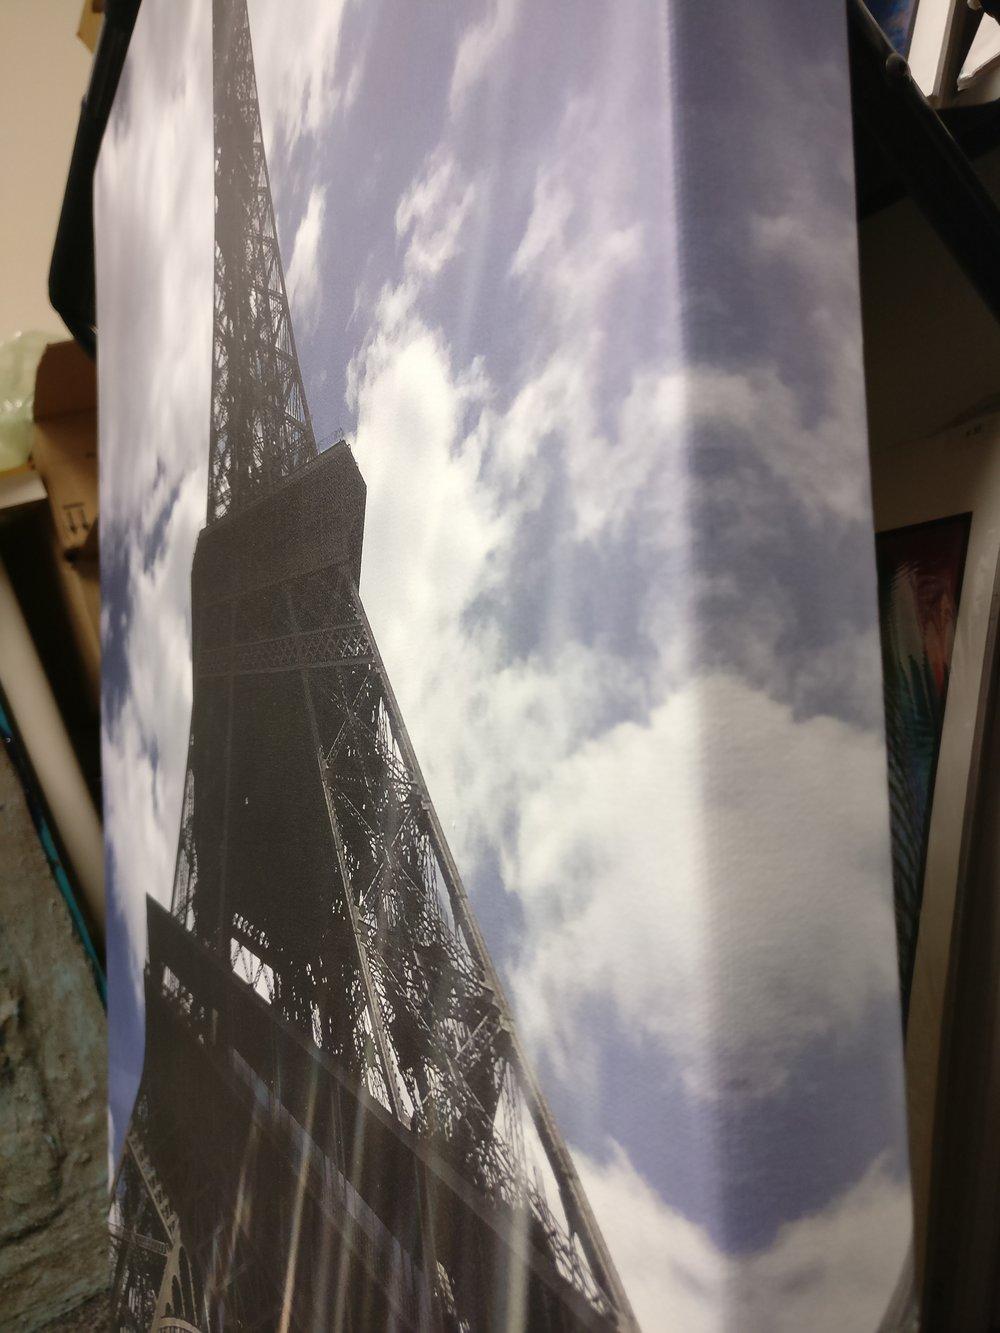 print on exhibition satin canvas, gallery wrap